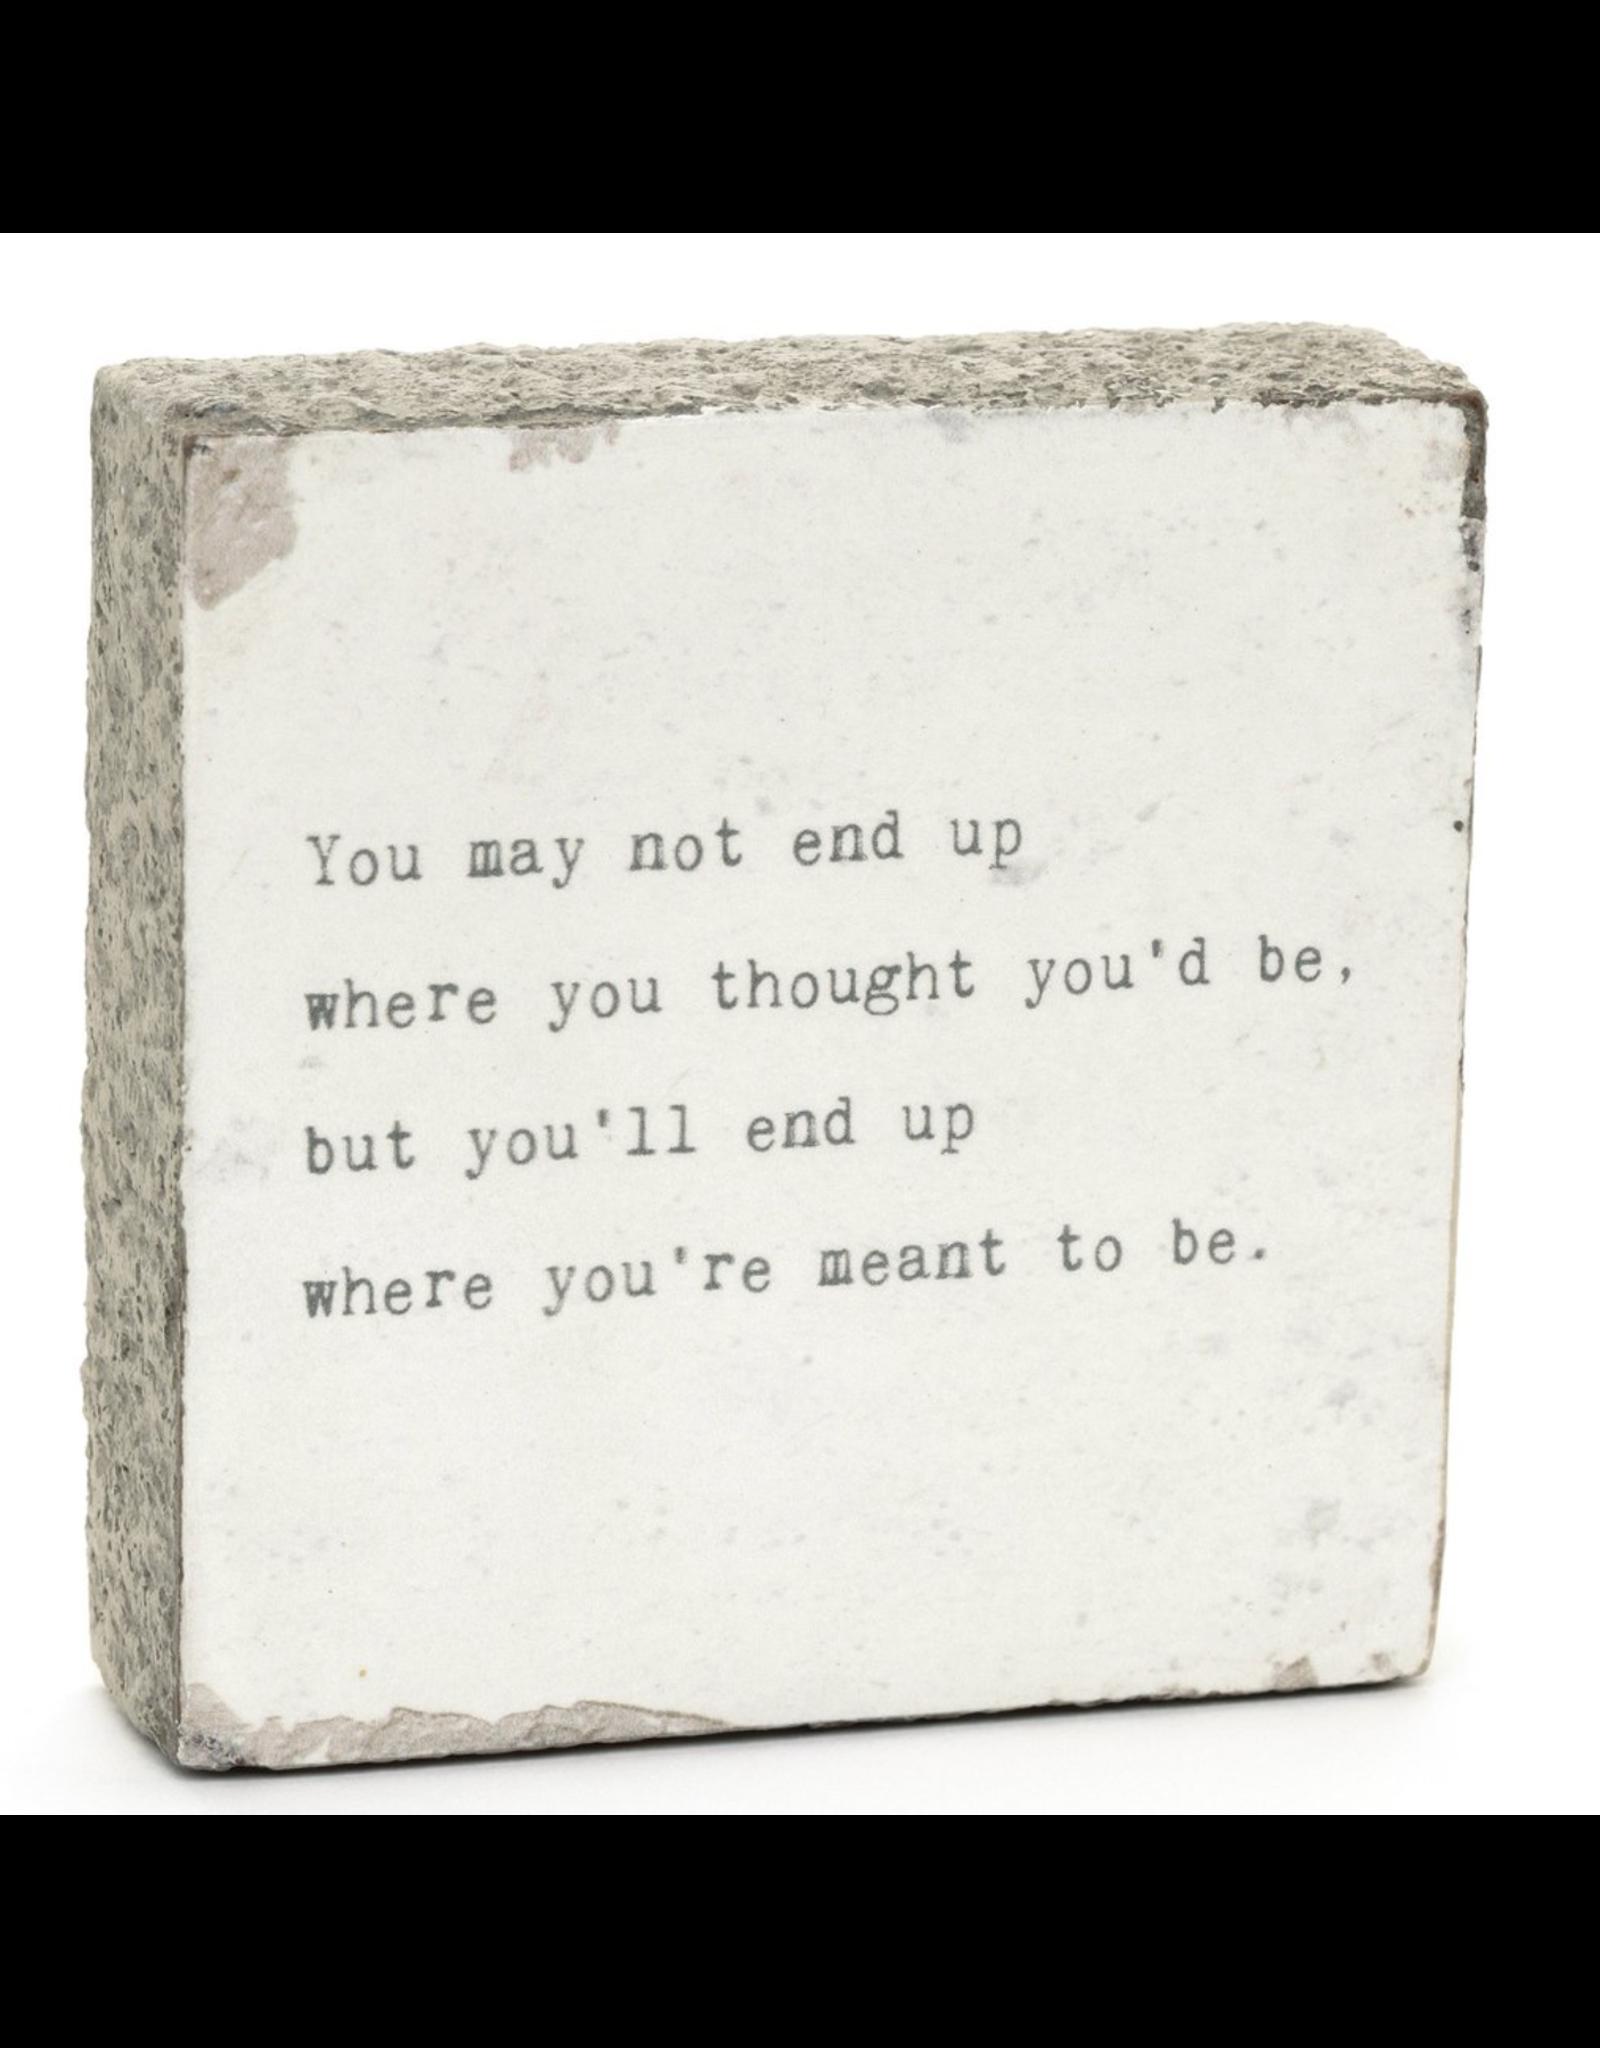 Wall Block - May Not End Up